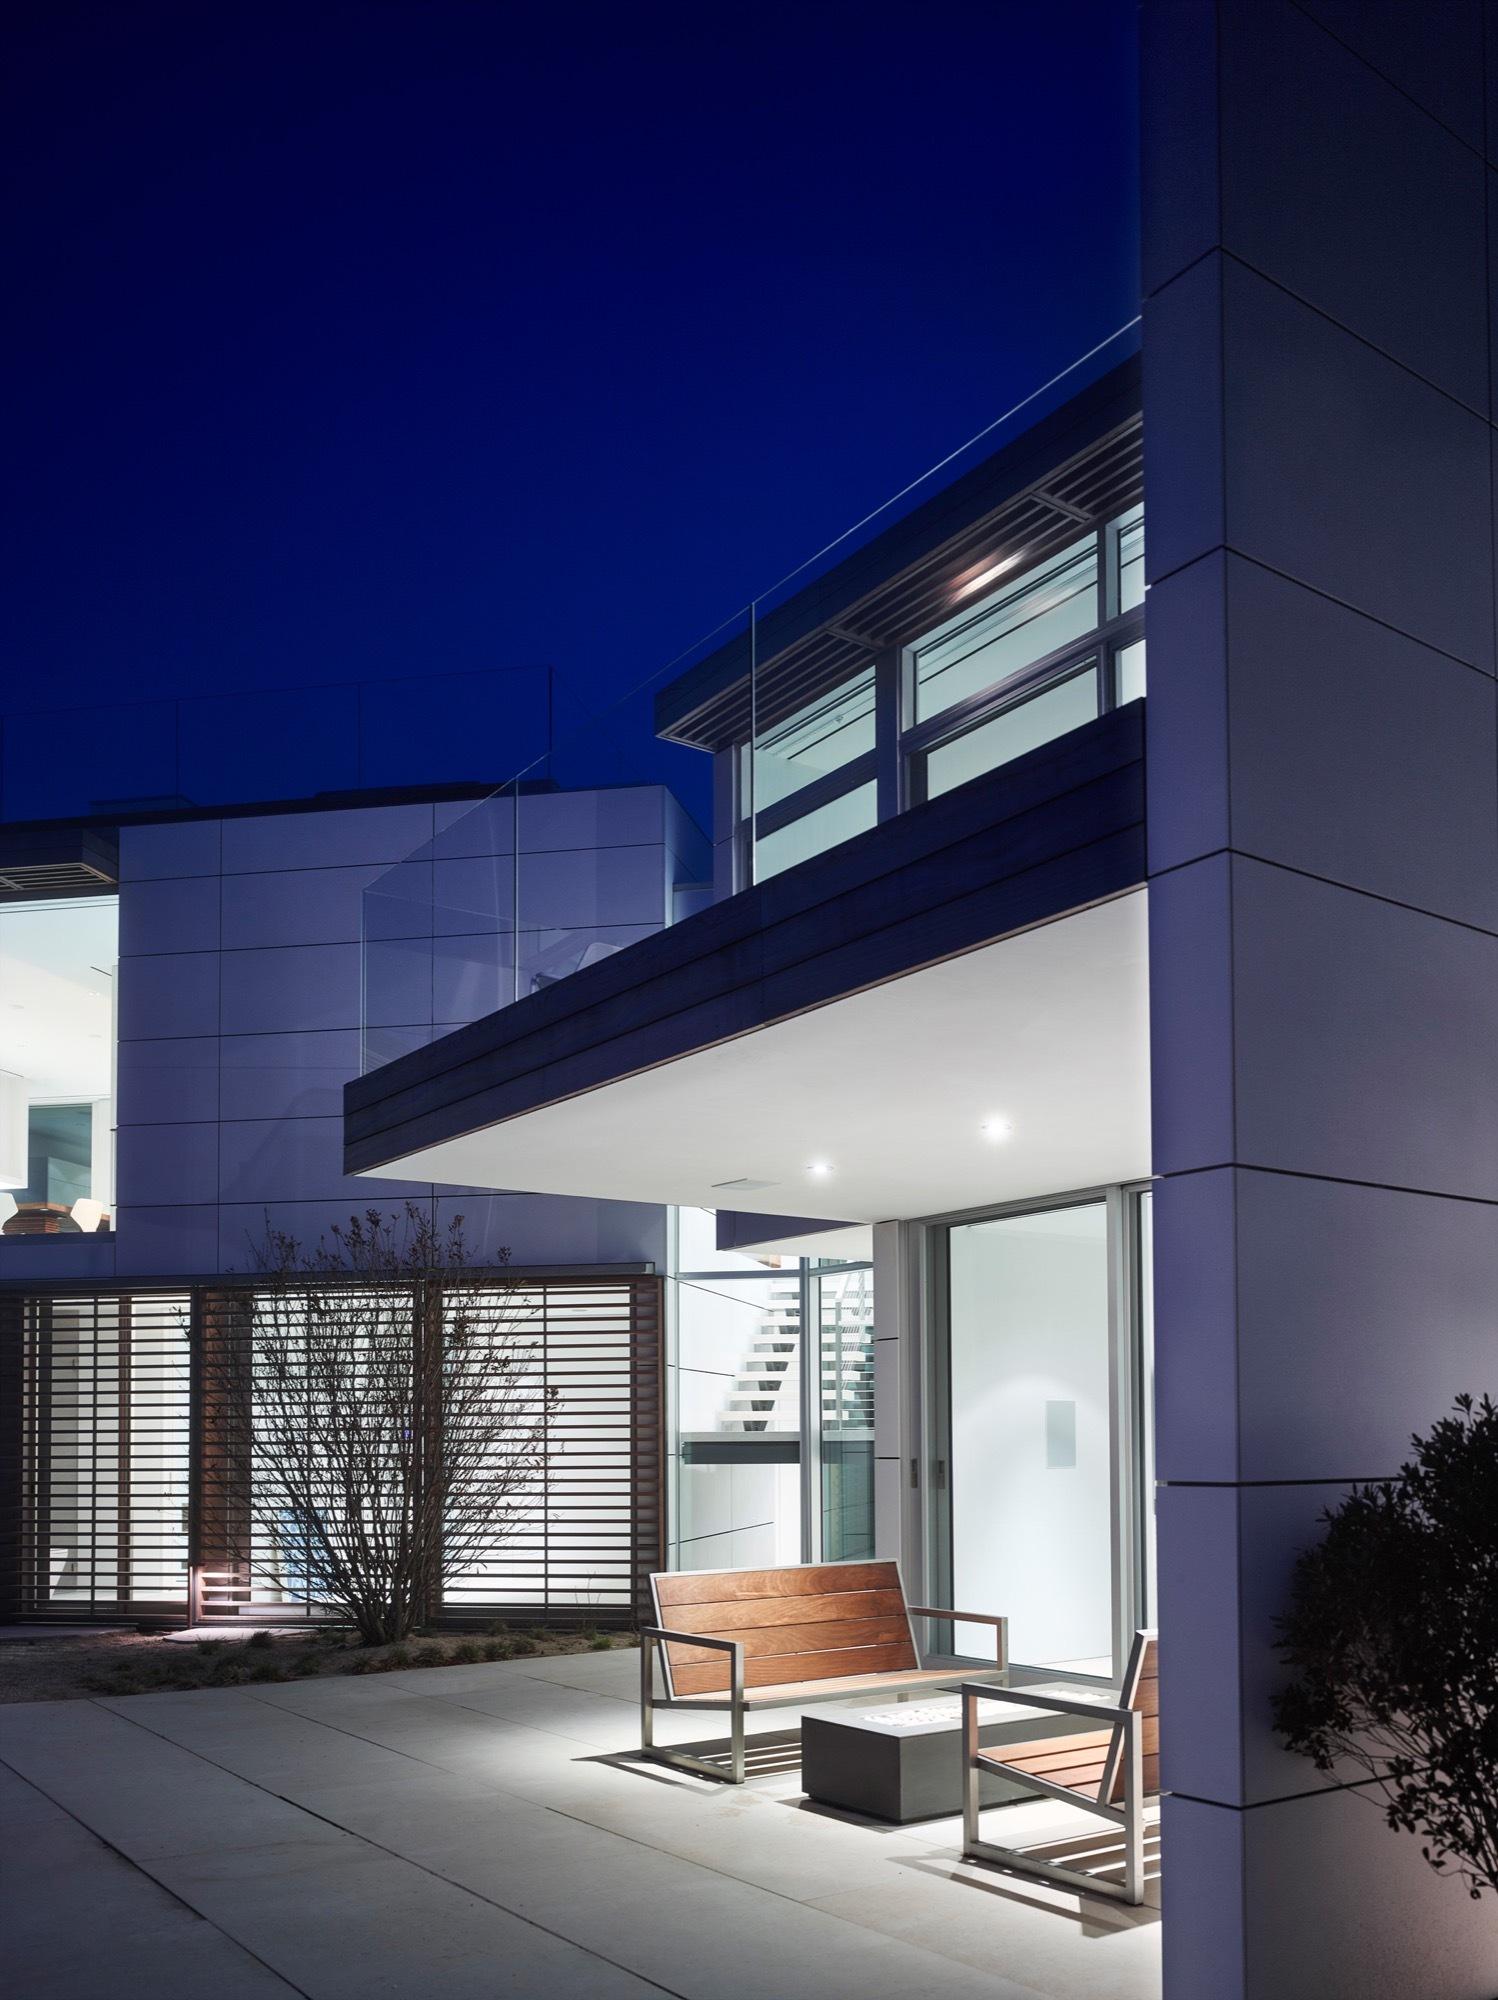 Galer a de casa en las dunas stelle lomont rouhani architects 13 - Casa las dunas ...